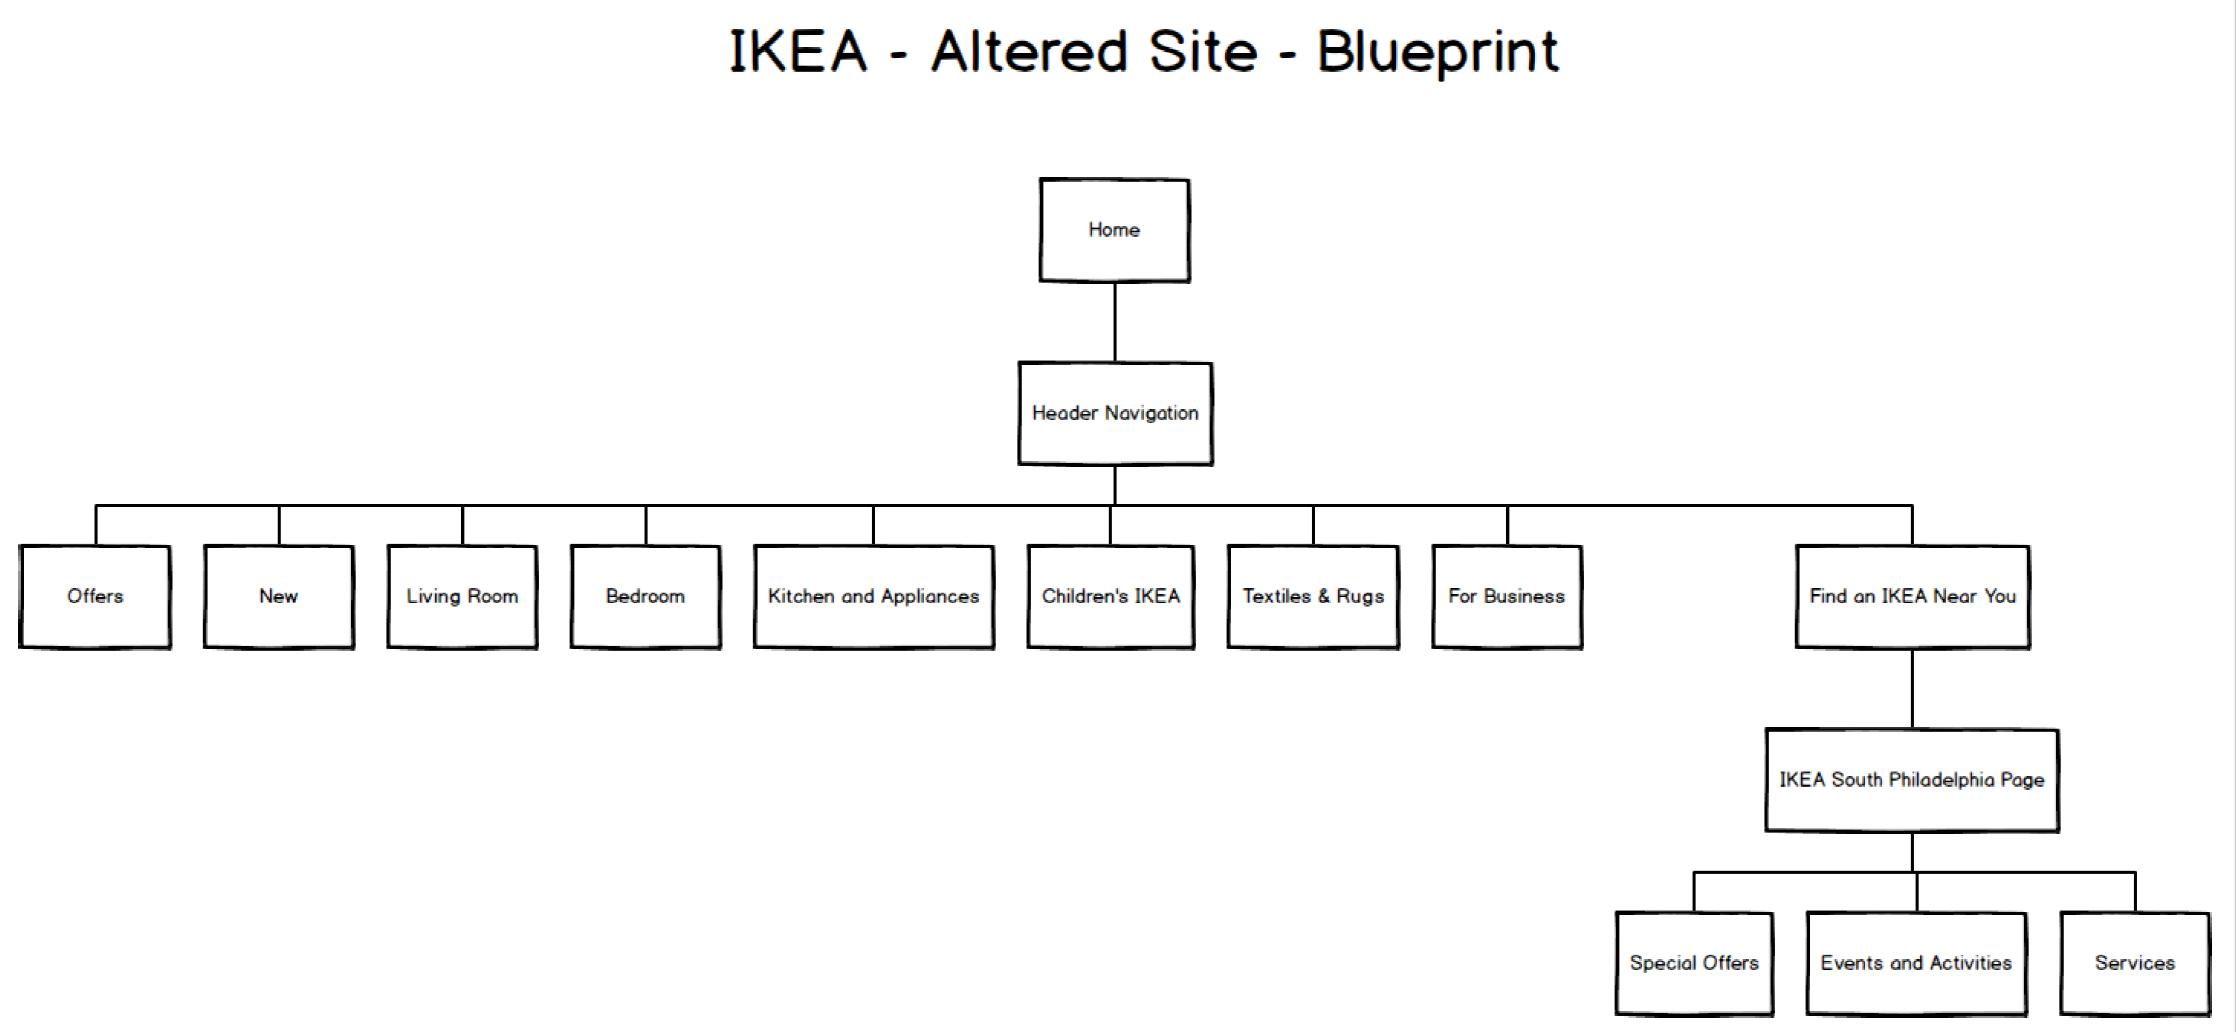 Ikea user experience analysis web user experience designer ikea original blueprint ikea altered blueprint malvernweather Gallery